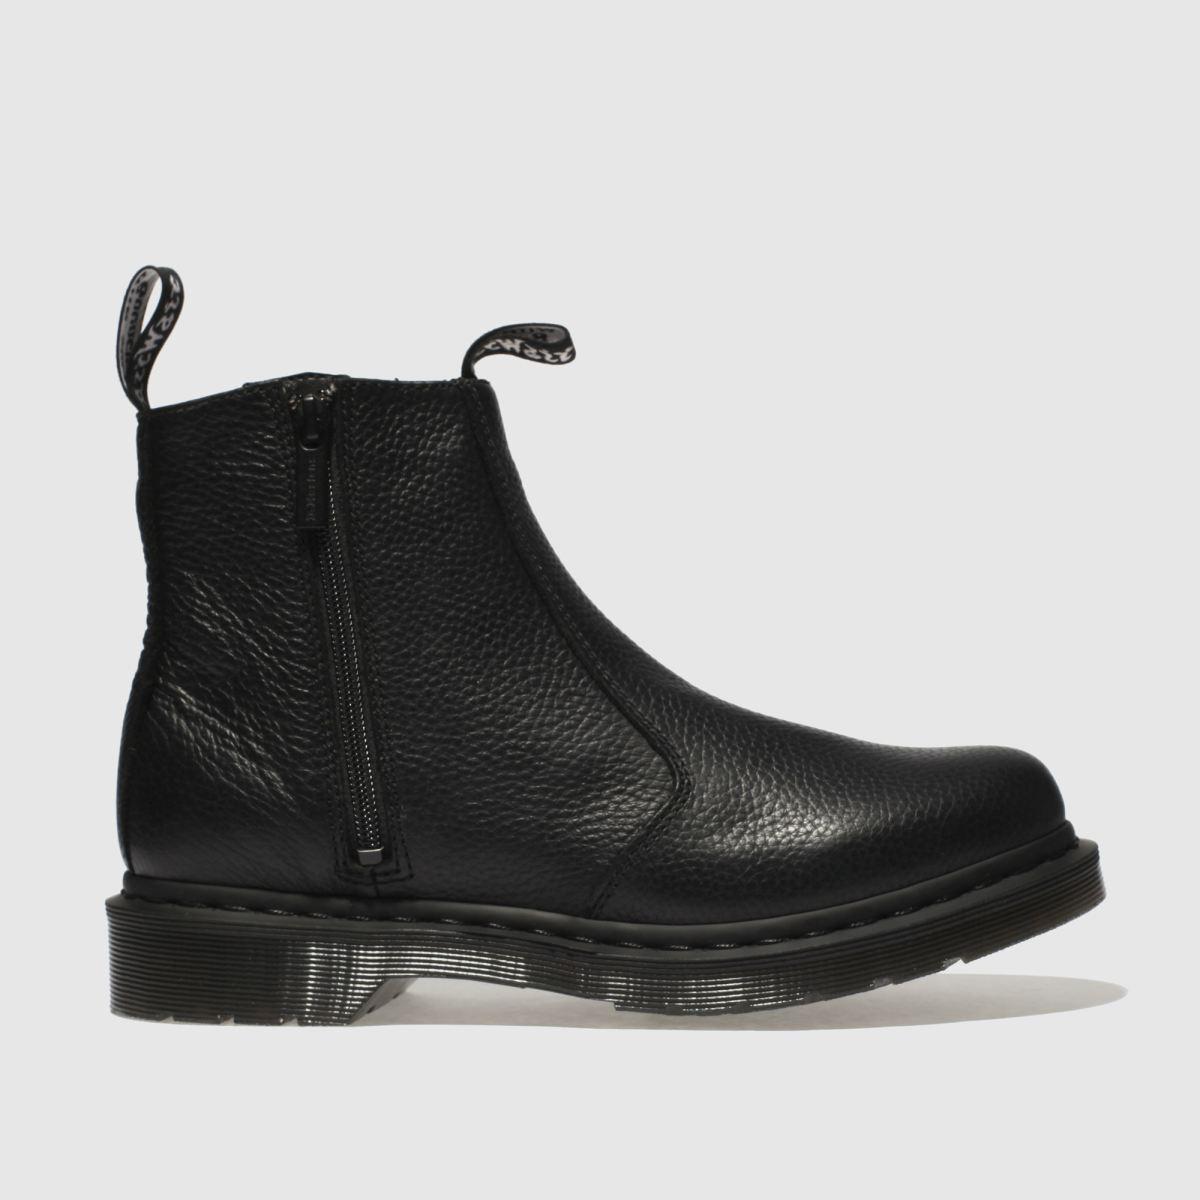 Dr Martens Black 2976 Zip Chelsea Boots